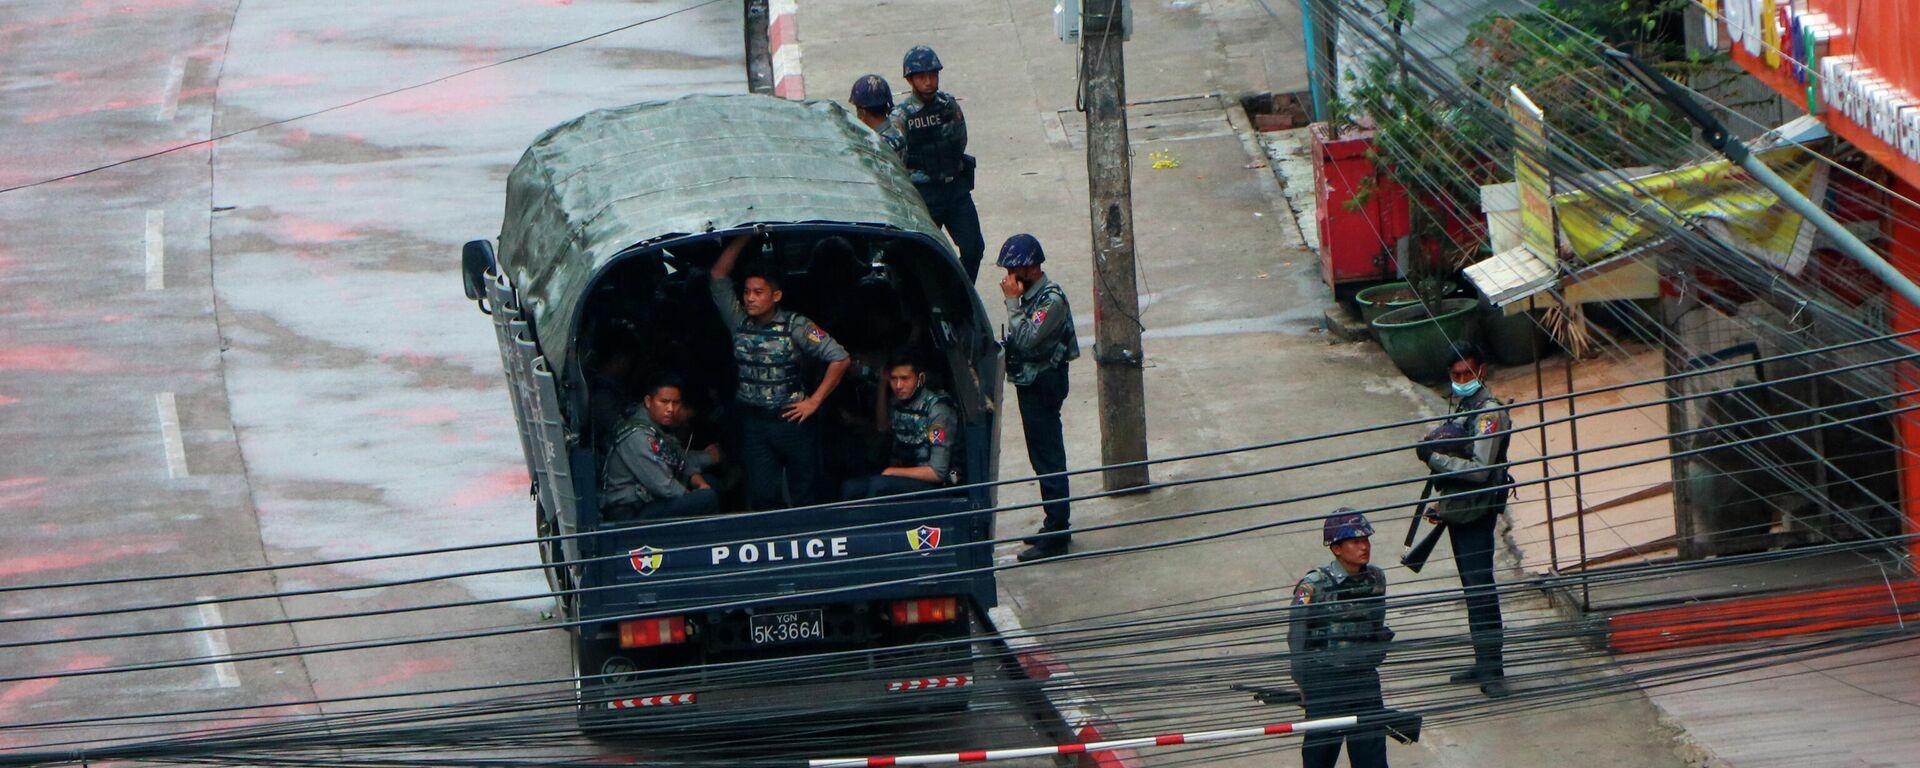 Polizeibeamte in Myanmar - SNA, 1920, 23.05.2021